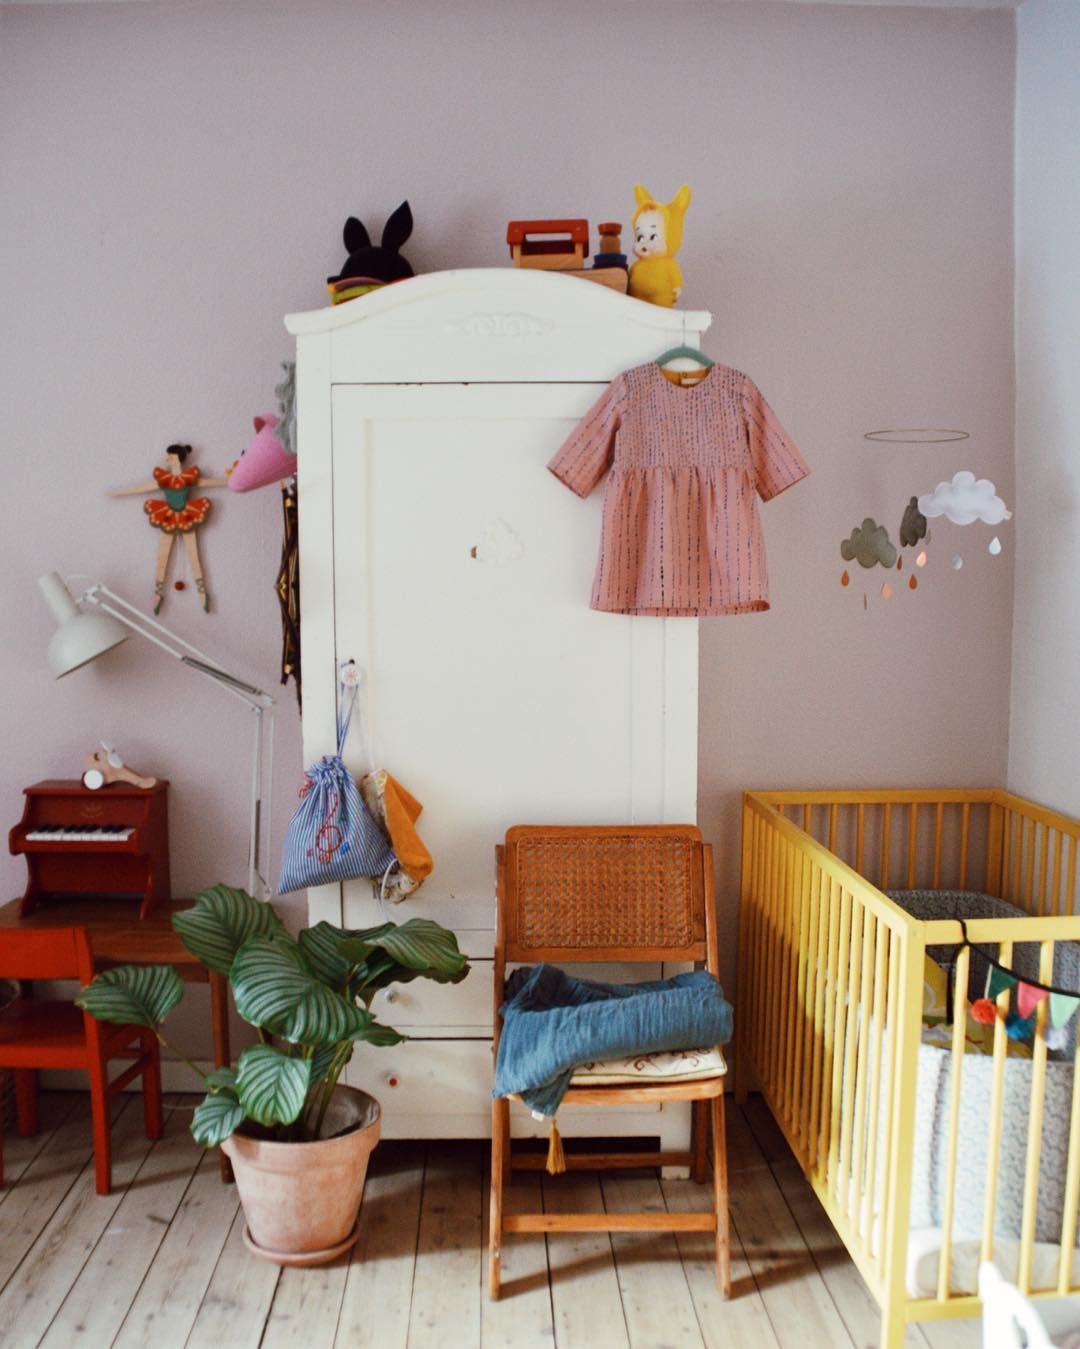 Colourful nursery | Kids room inspiration, Kids bedroom ...